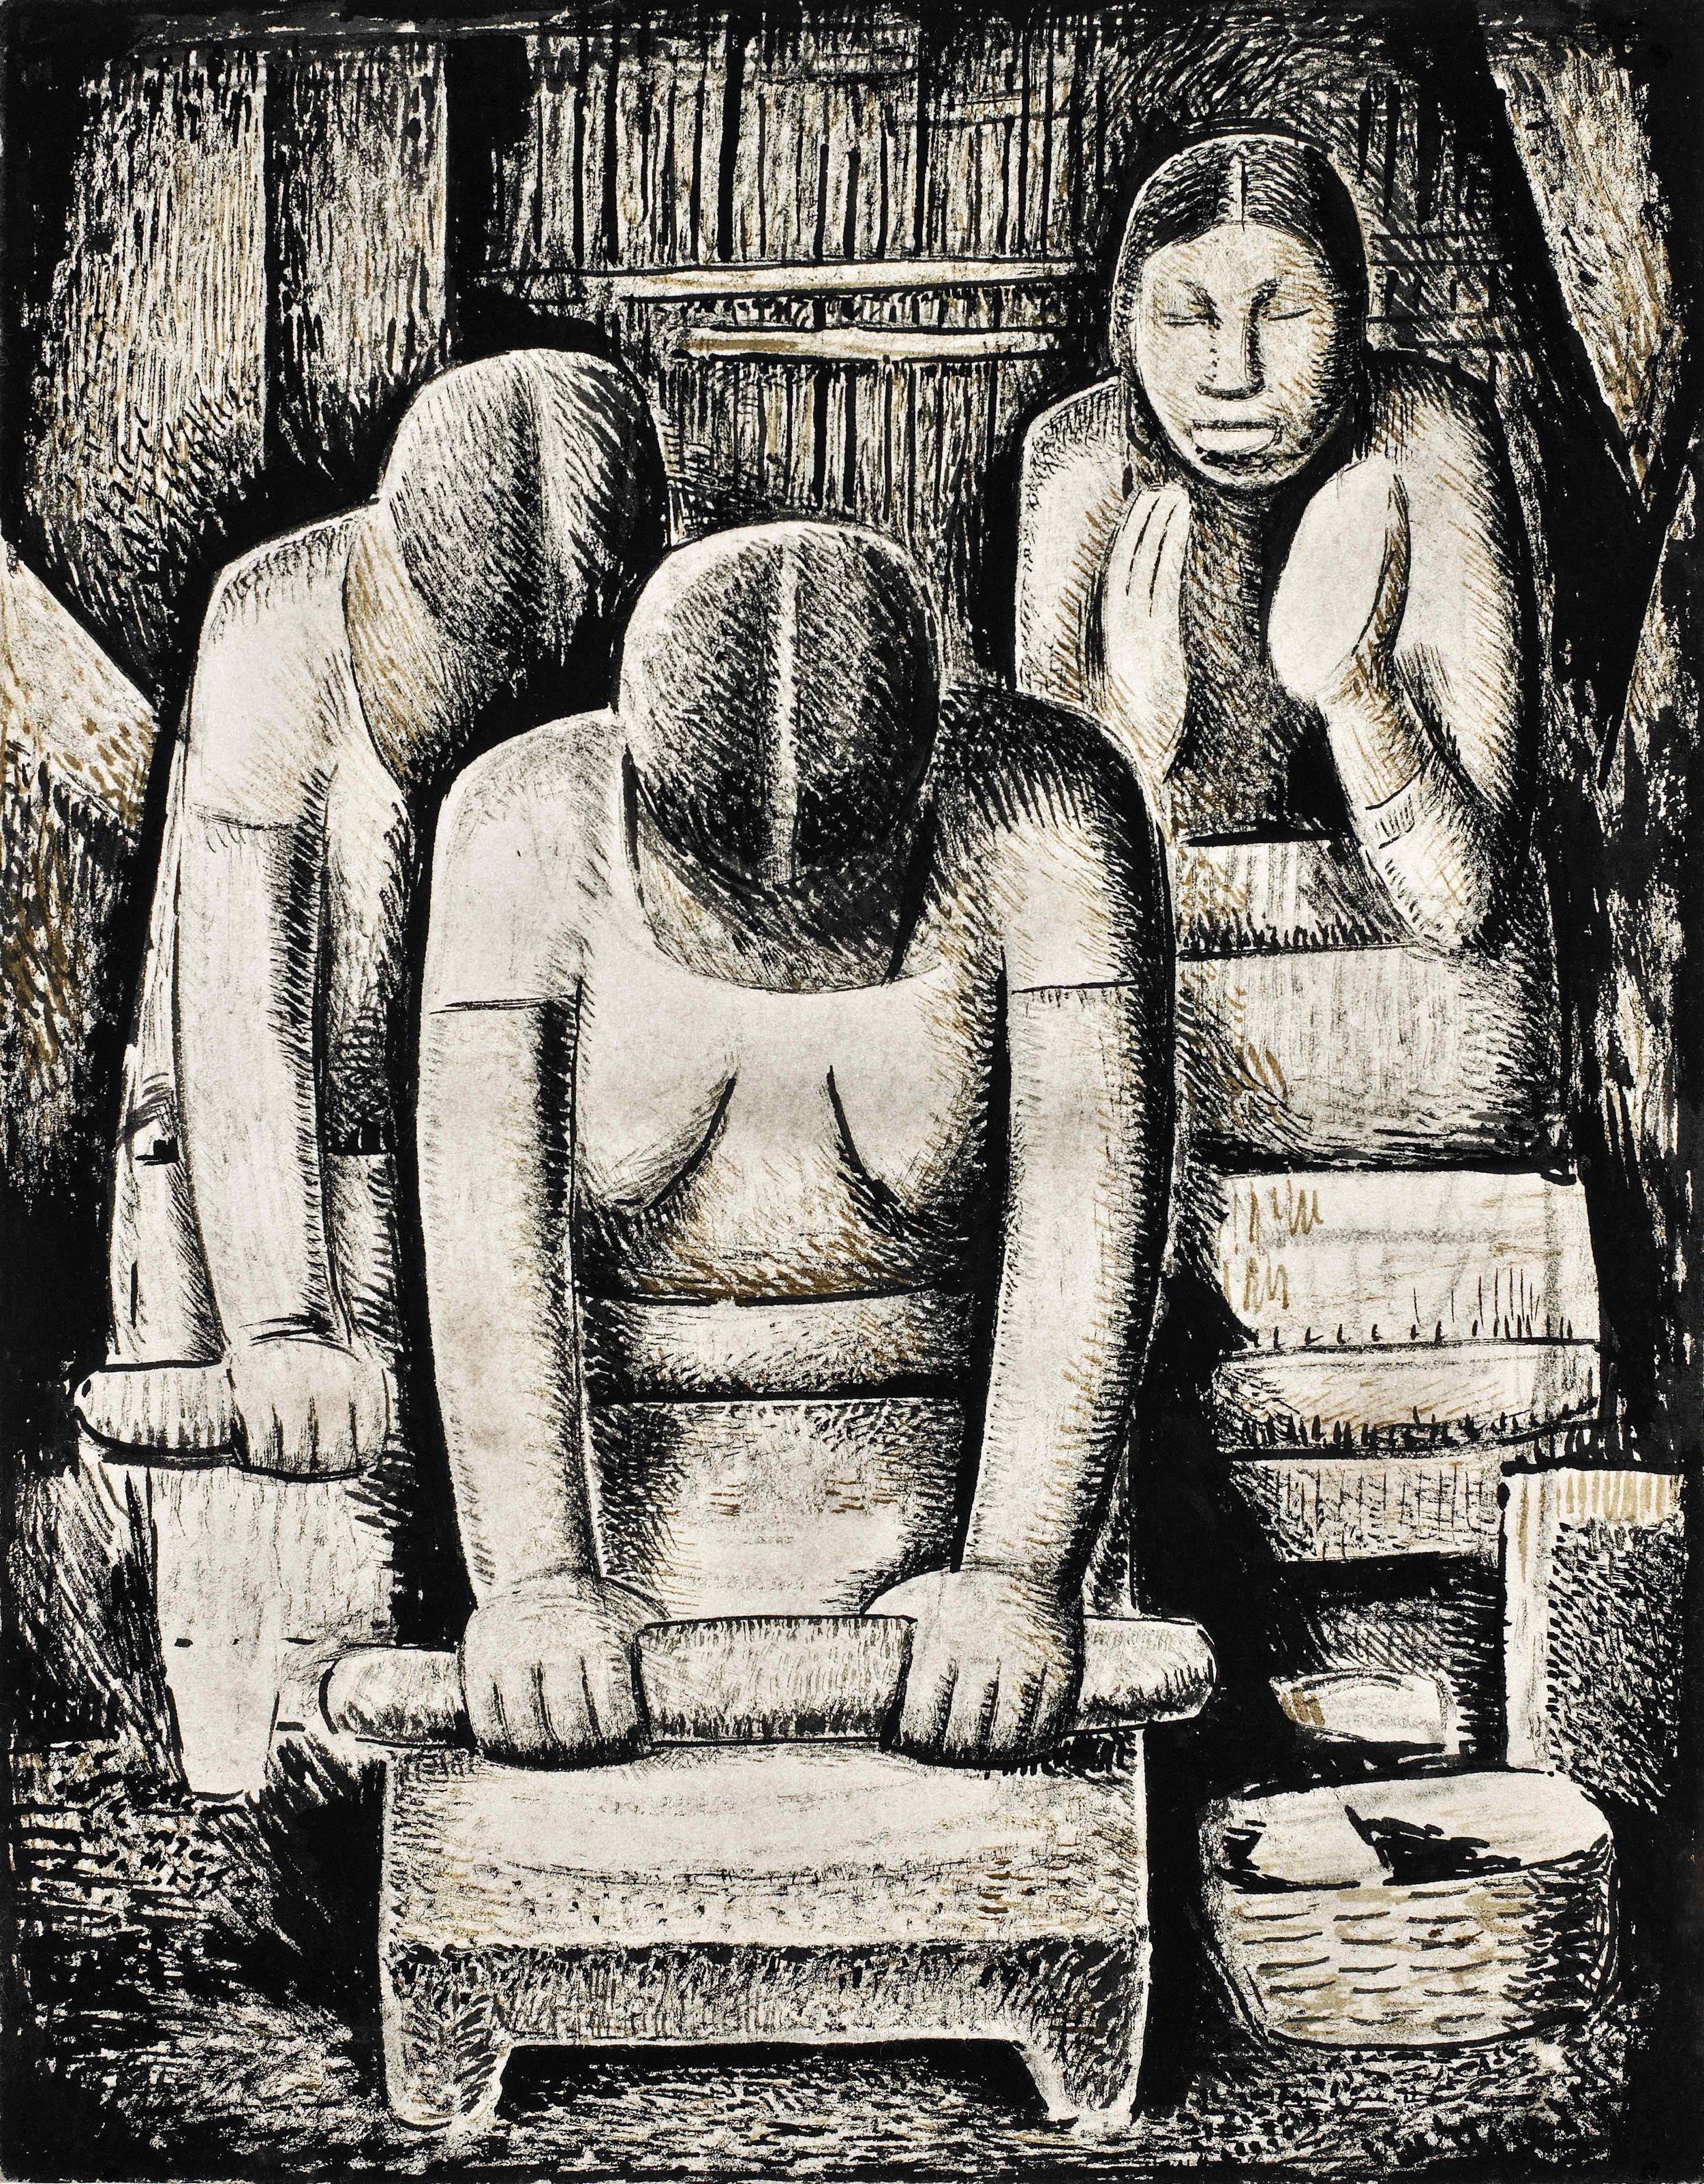 Las Tortilleras / The Tortilla Makers  ca. 1938 tempera on paper / temple sobre papel 11.8 x 9.4; 29.8 x 23.8 centímetros Private collection